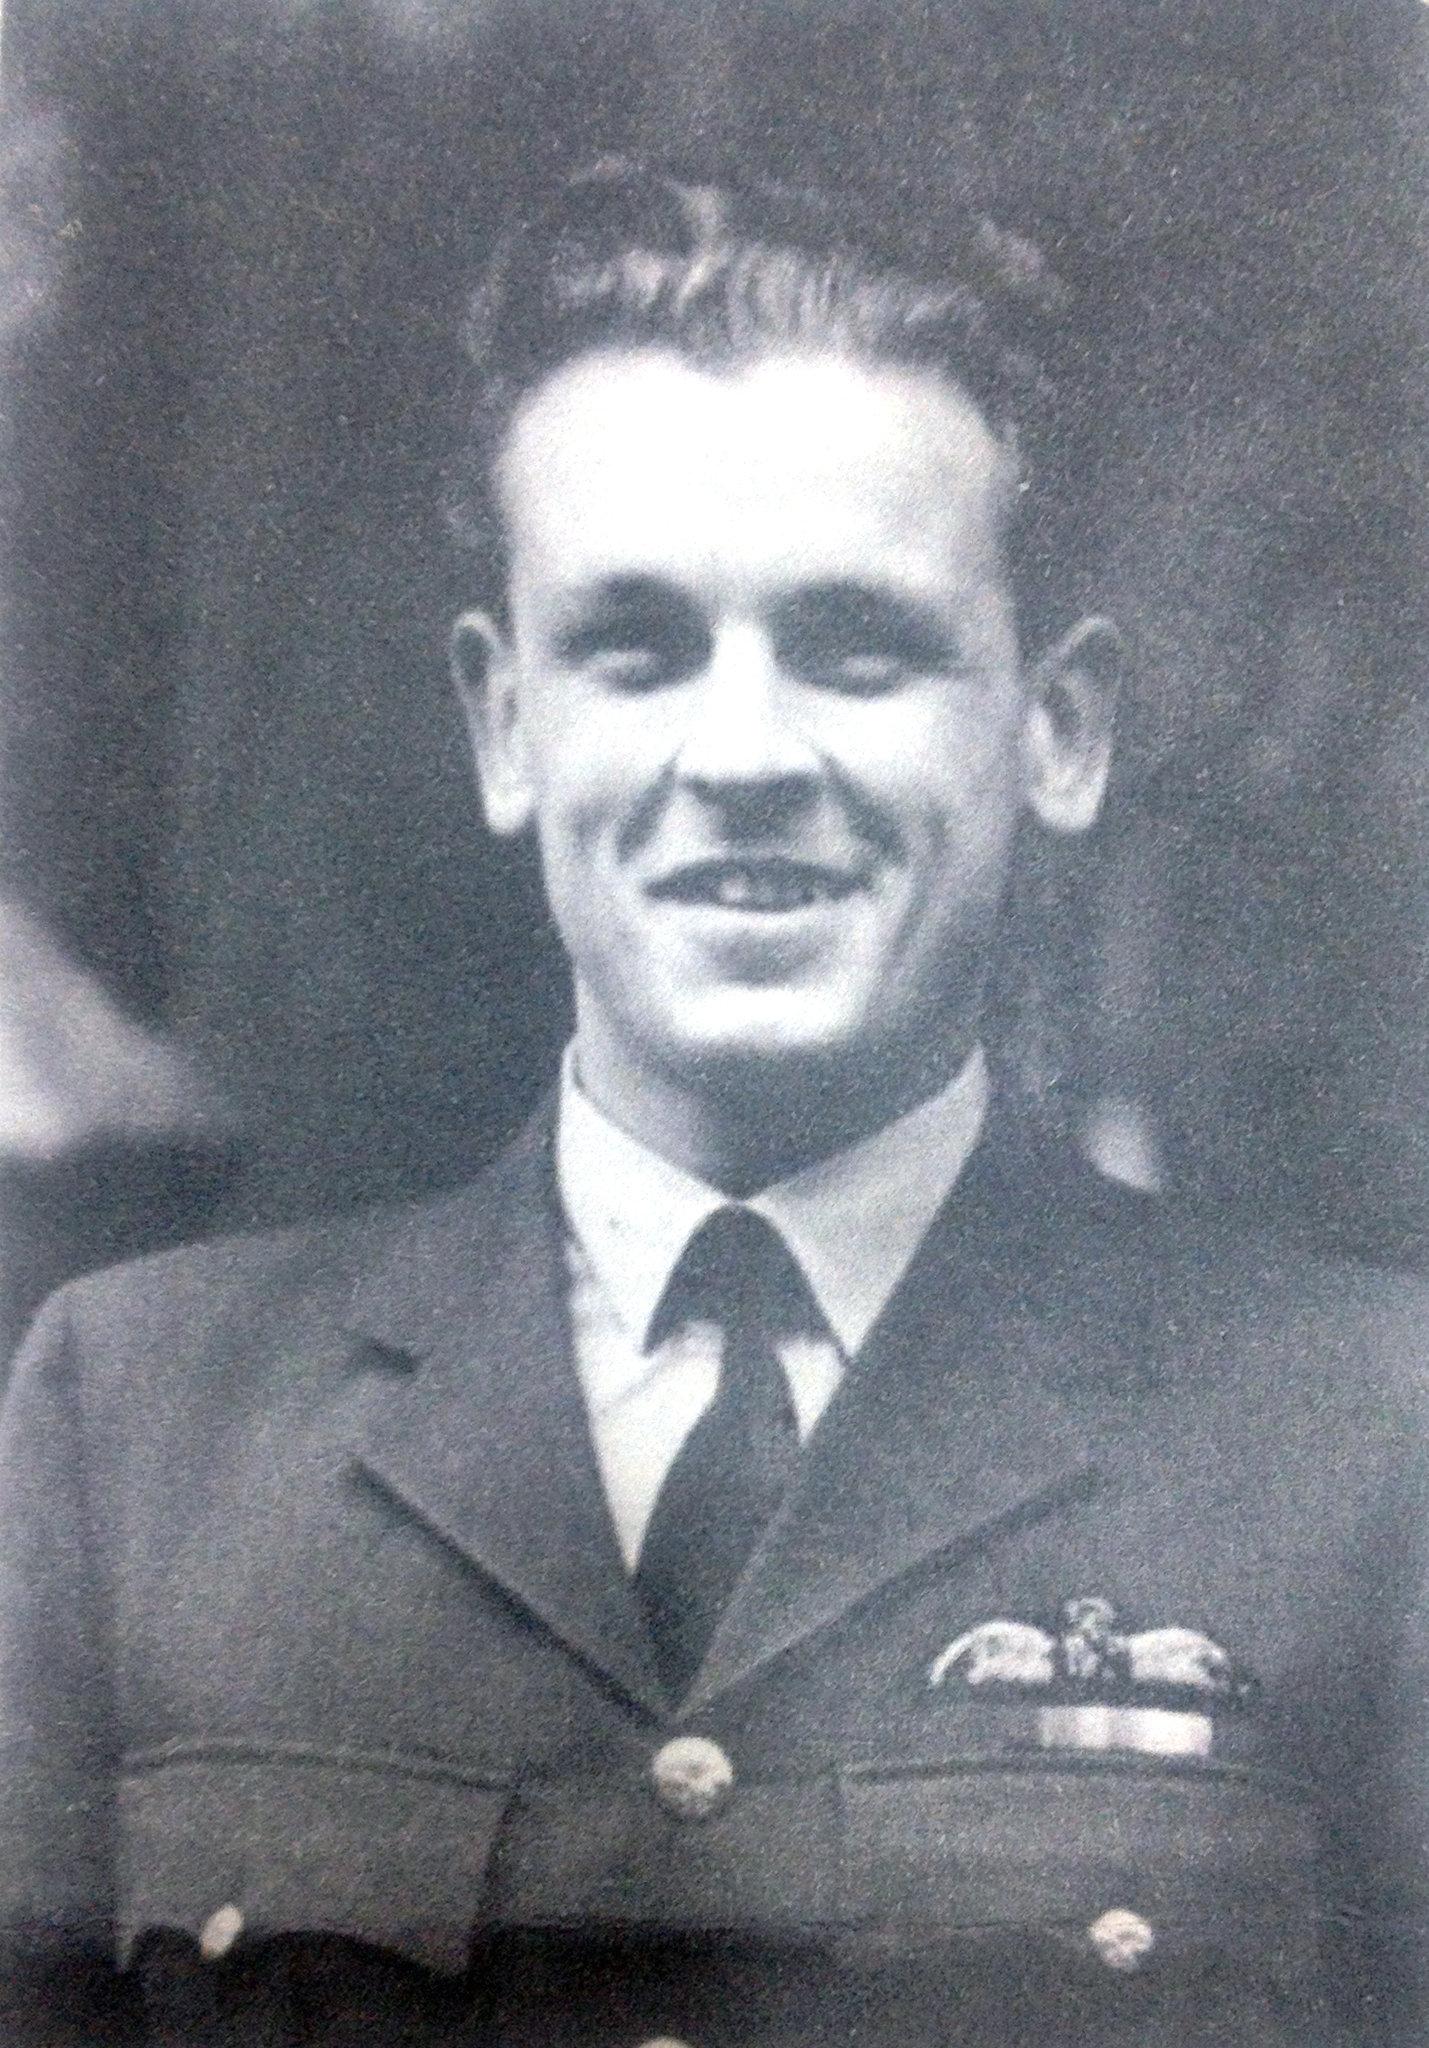 Dick Churchill